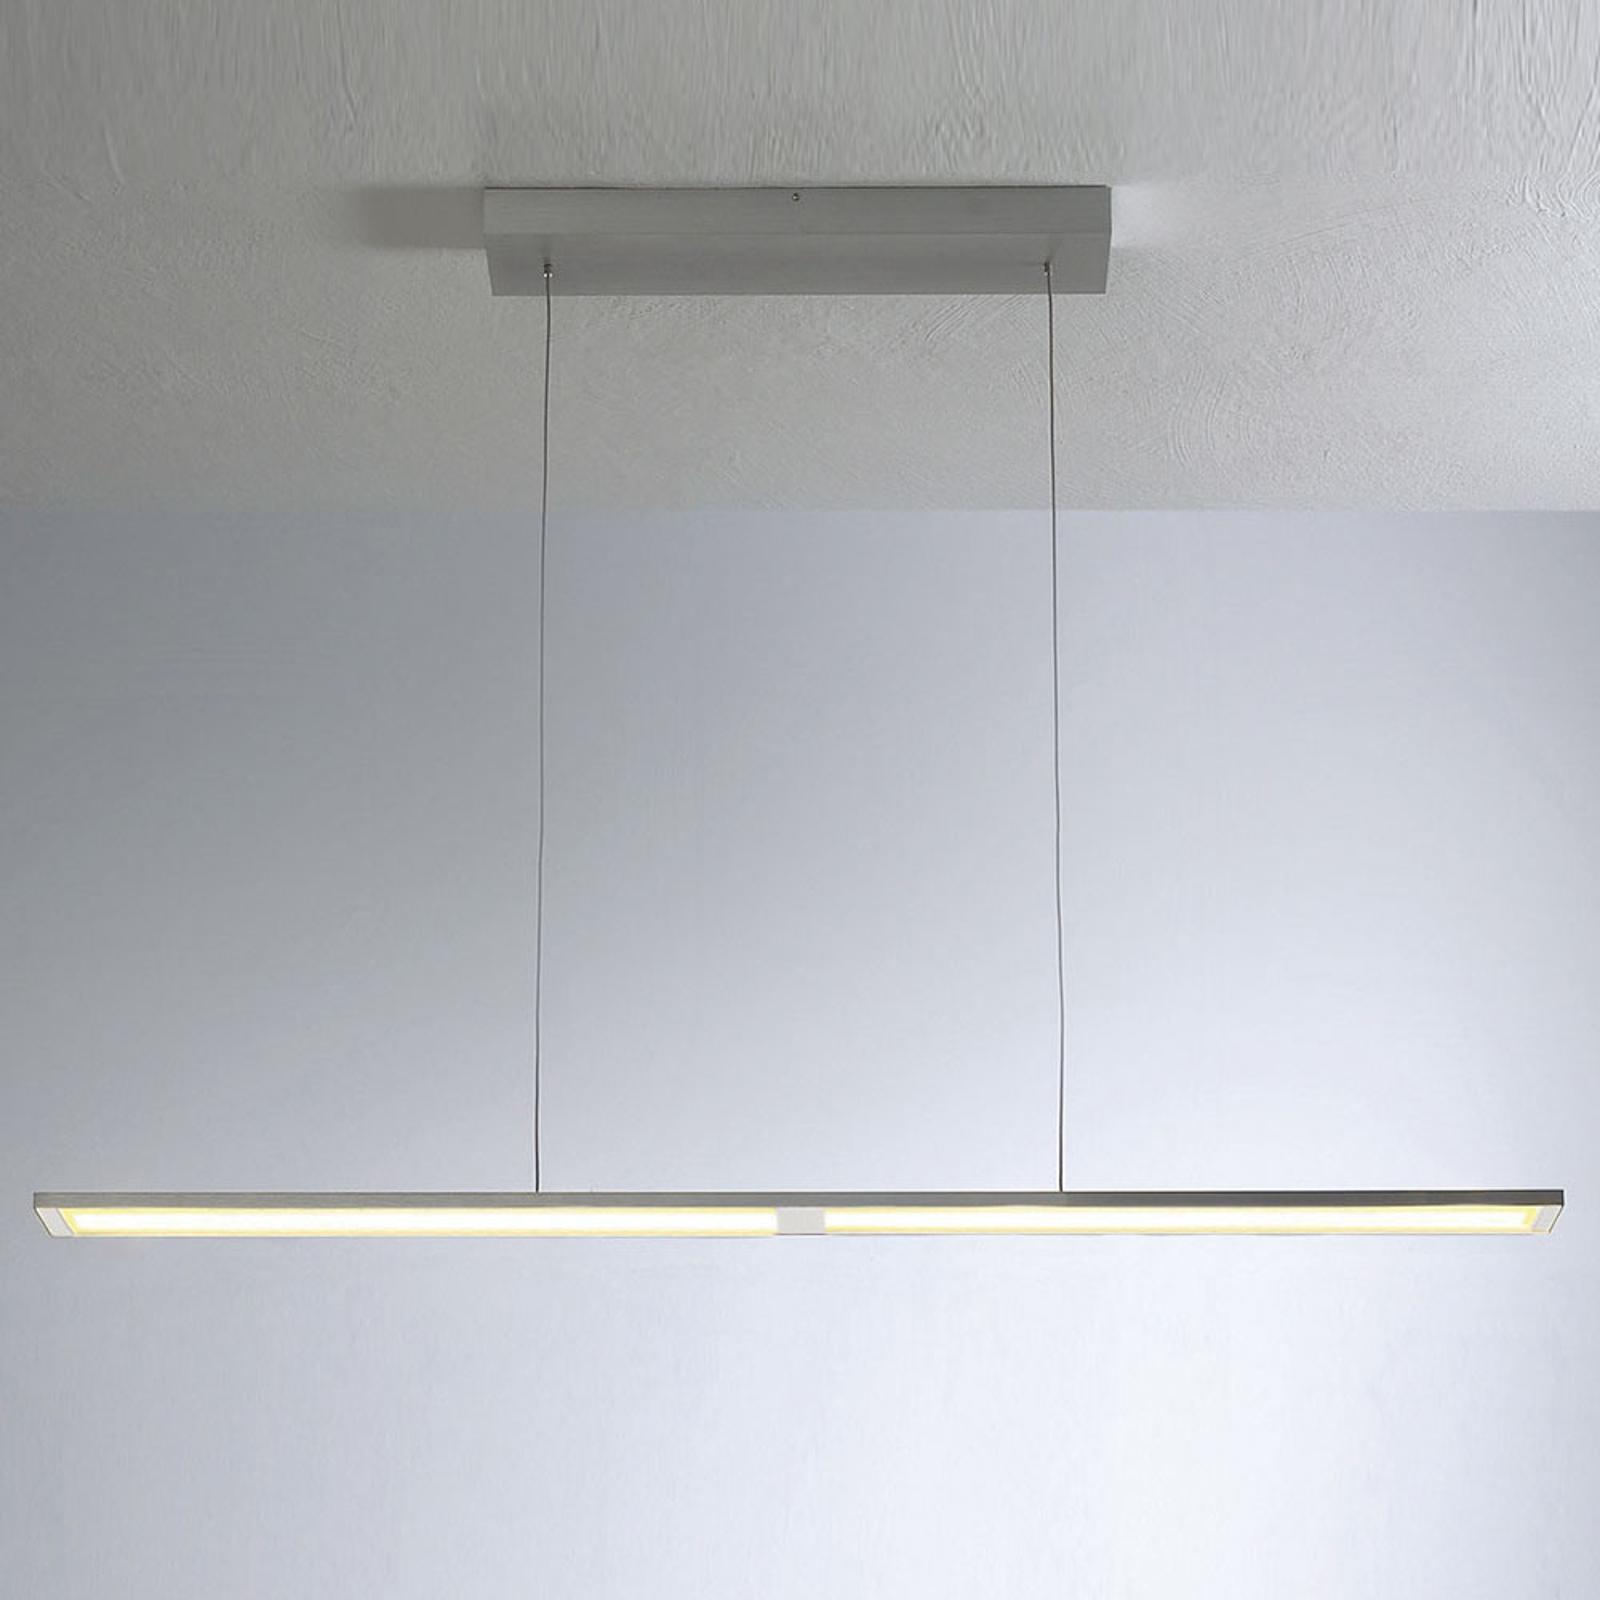 Bopp Fly LED-hængelampe, 115 cm, justerbar, alu